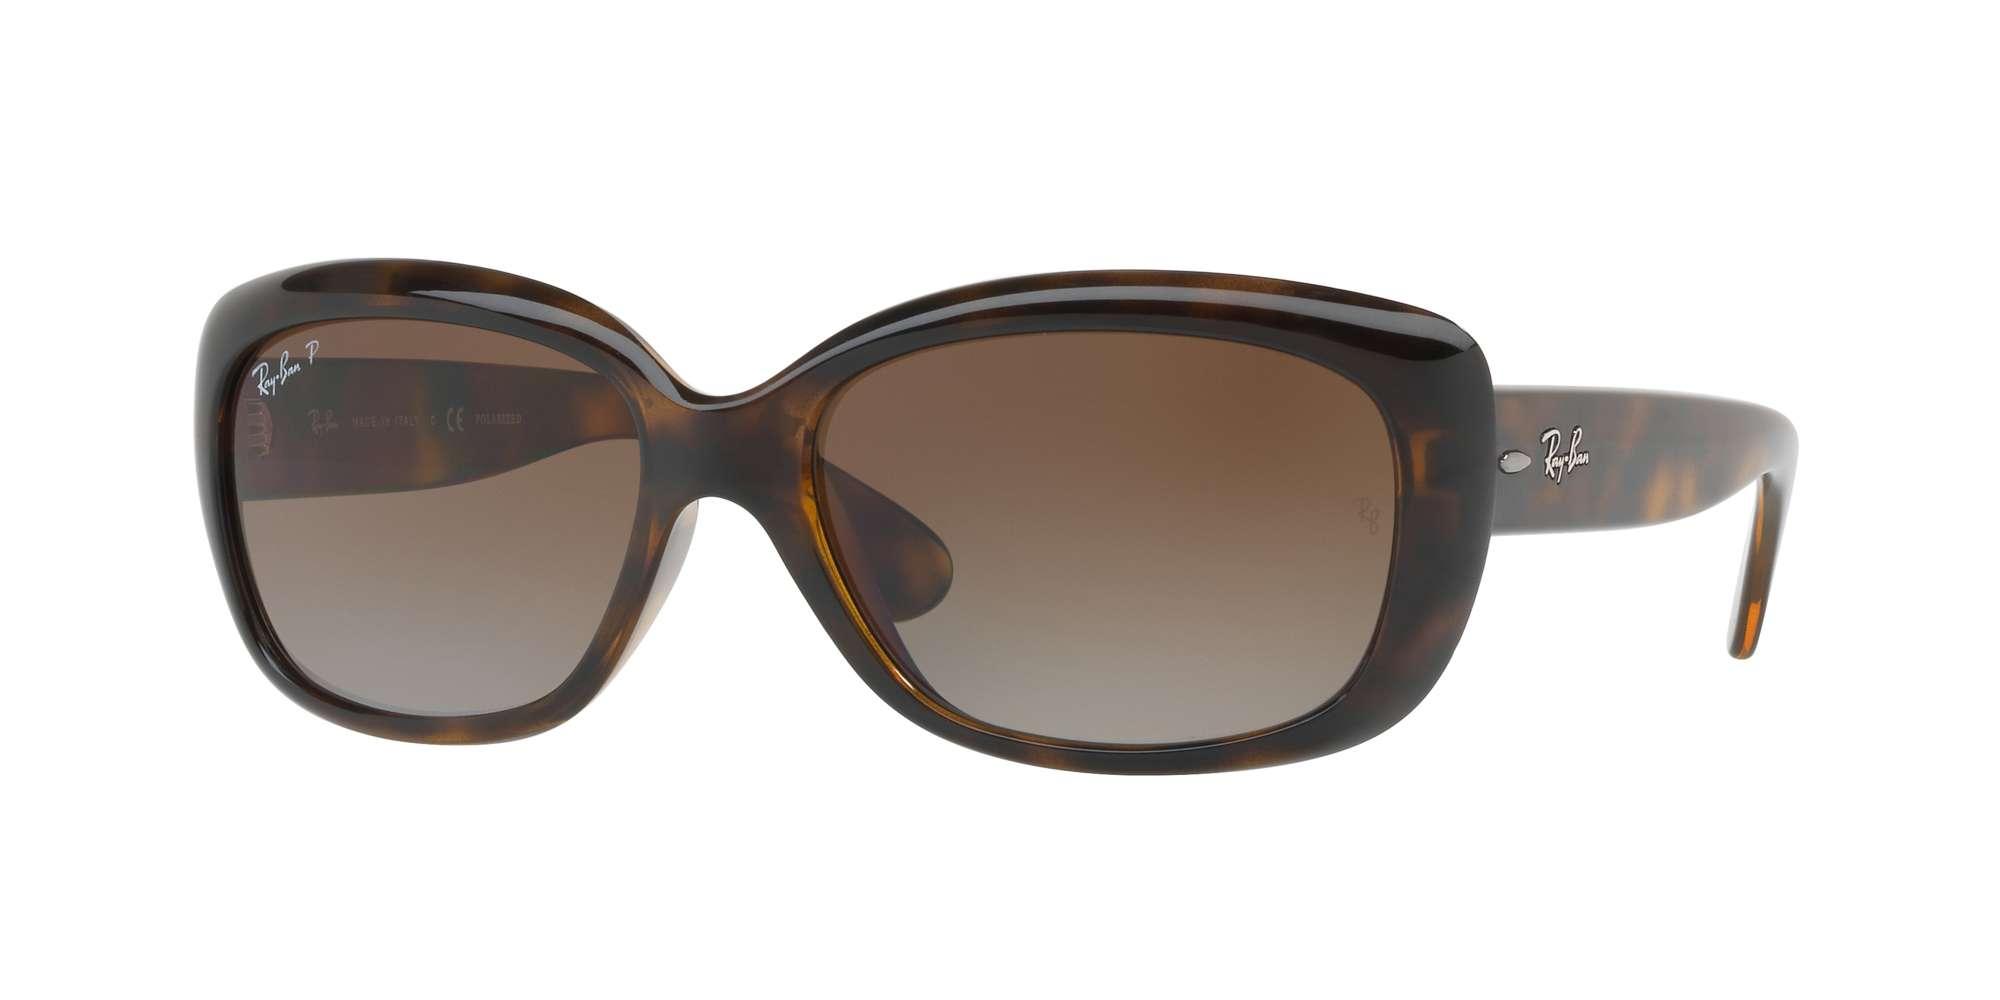 LIGHT HAVANA / GREY GRADIENT BROWN POLAR lenses